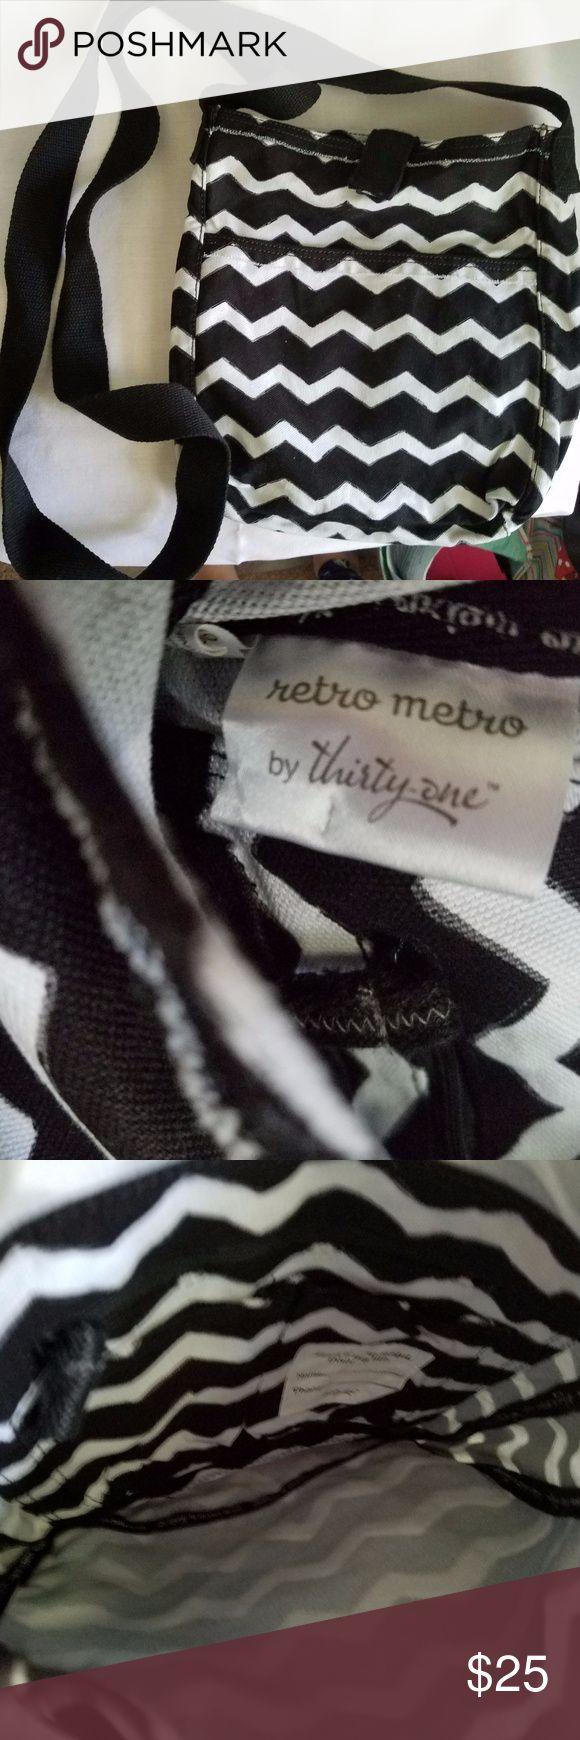 NWOT Retro Metro Crossbody NWOT. Long crossbody bag. Black and white chevron. Never used. Thirty-One Bags Crossbody Bags